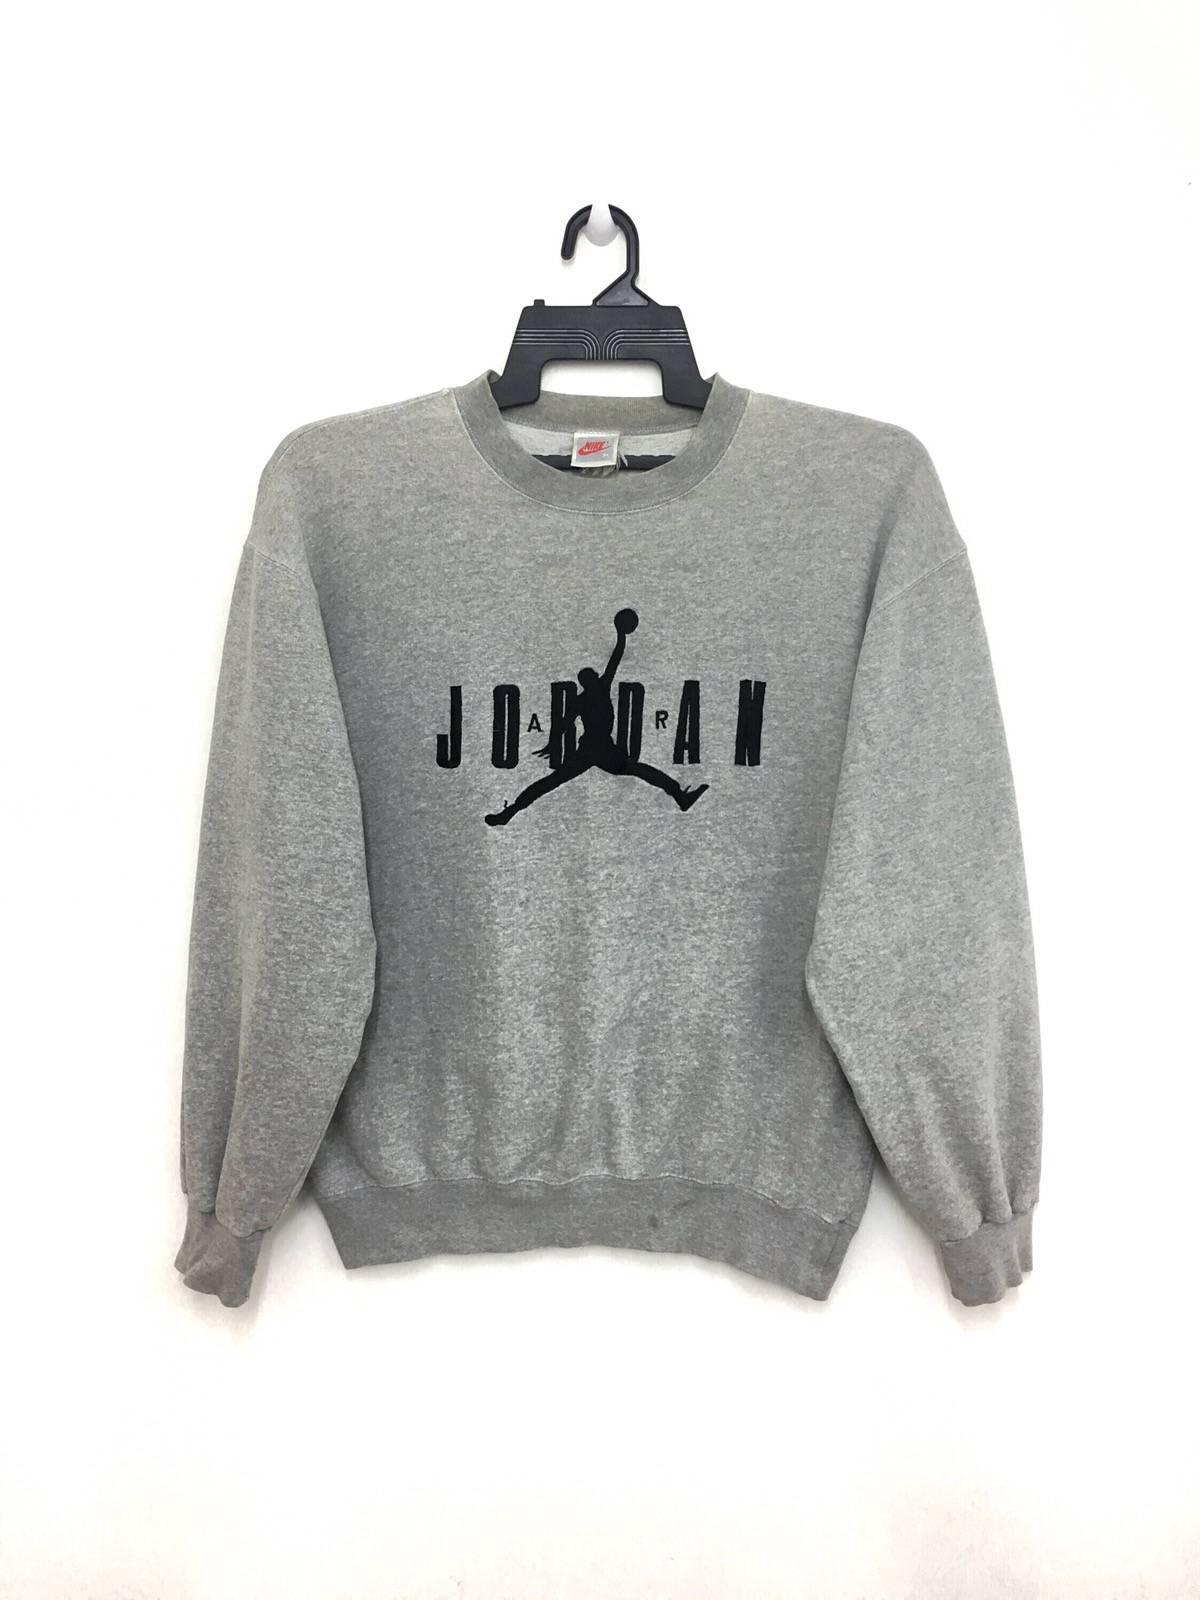 Nike Vintage 90 s Nike Air Jordan Sweatshirt Pullover Jumper ... 5ec25dba7e26